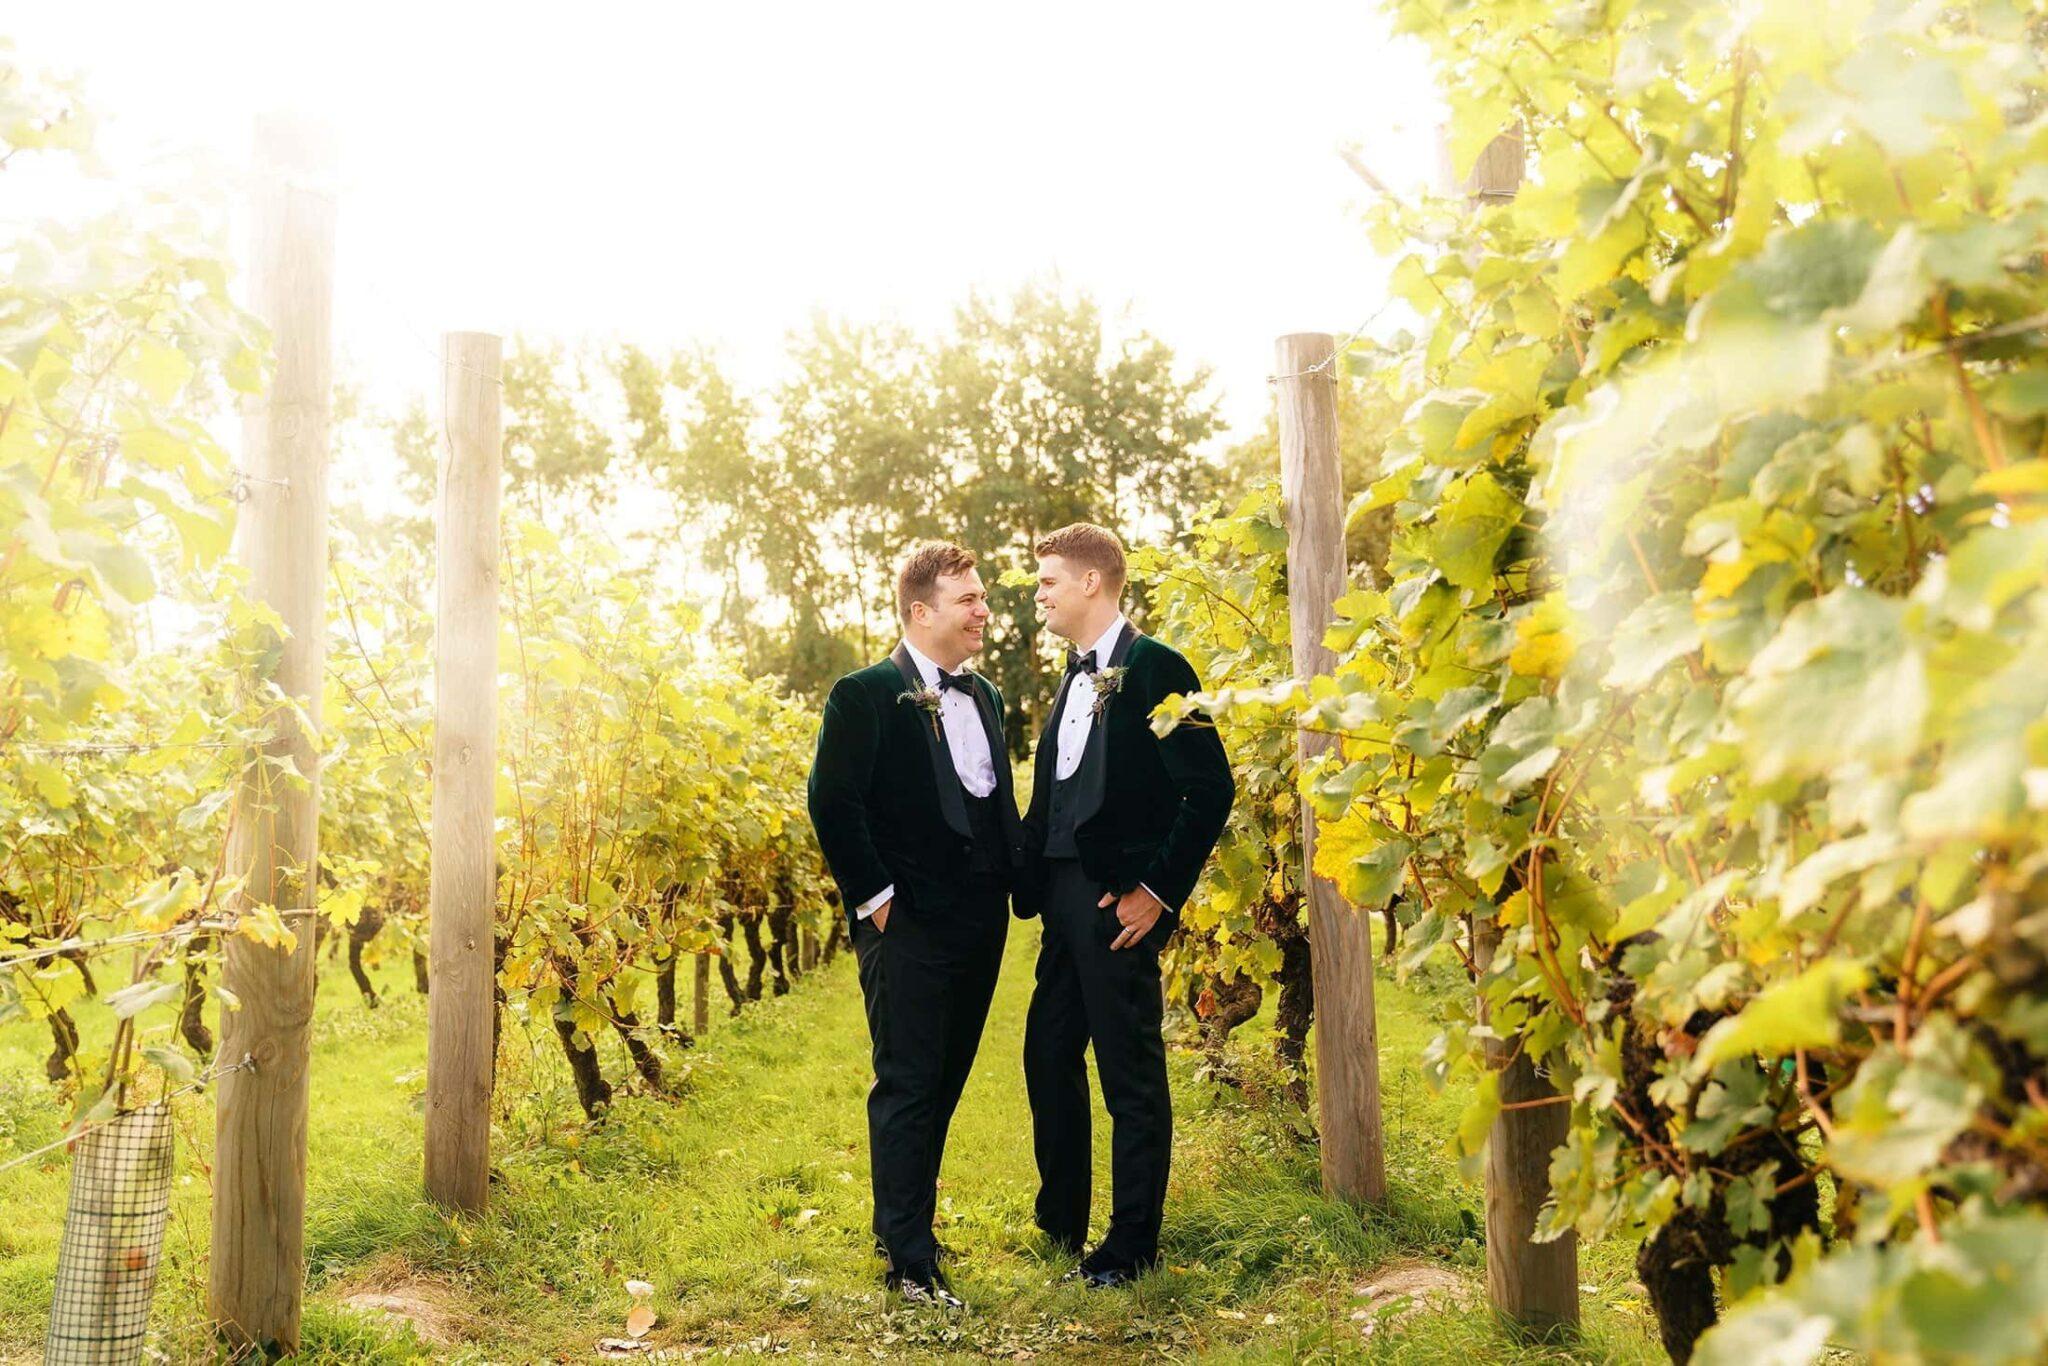 Great Lodge wedding photography of Rory & Bradley